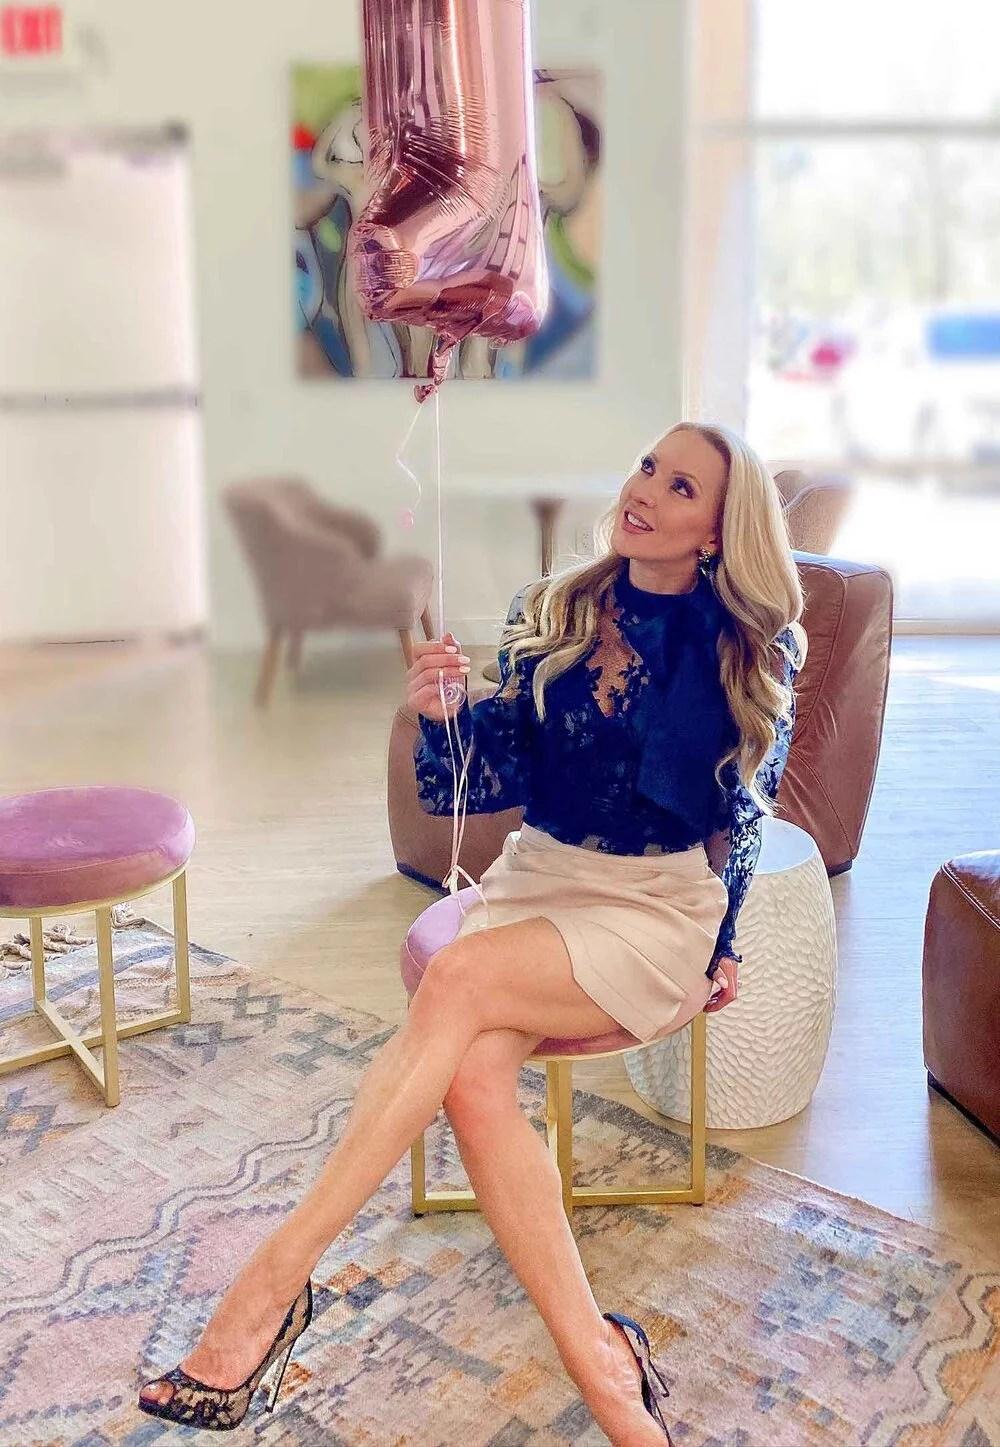 Spring Fashion Femme Lace finery black lace top fashion blogger Eve Dawes